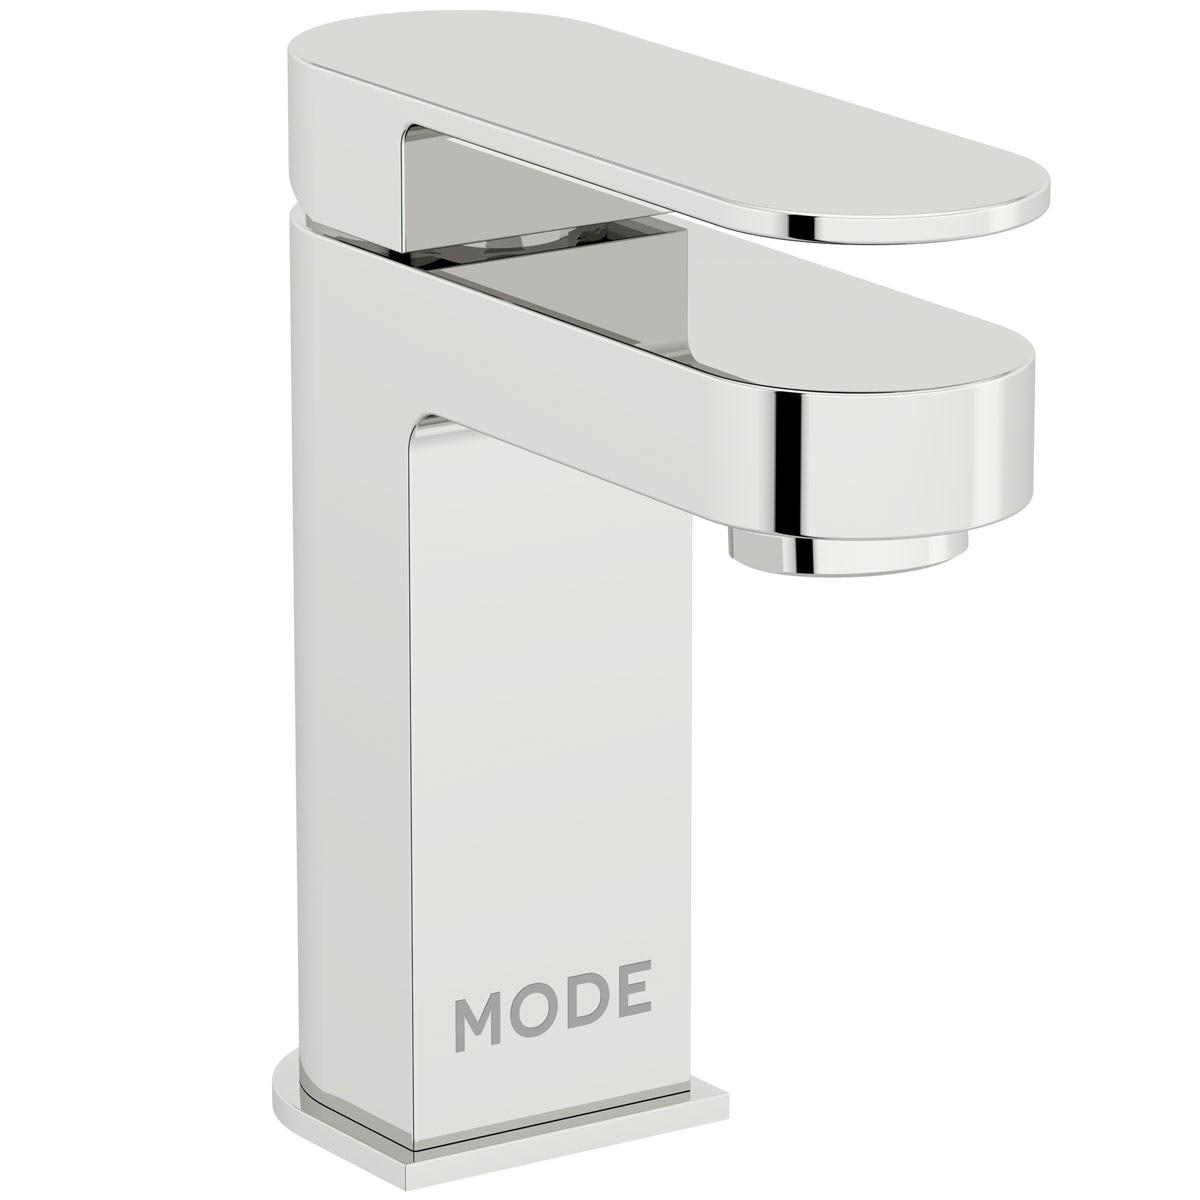 Mode Hardy Cloakroom Basin Mixer Tap Victoriaplum Com